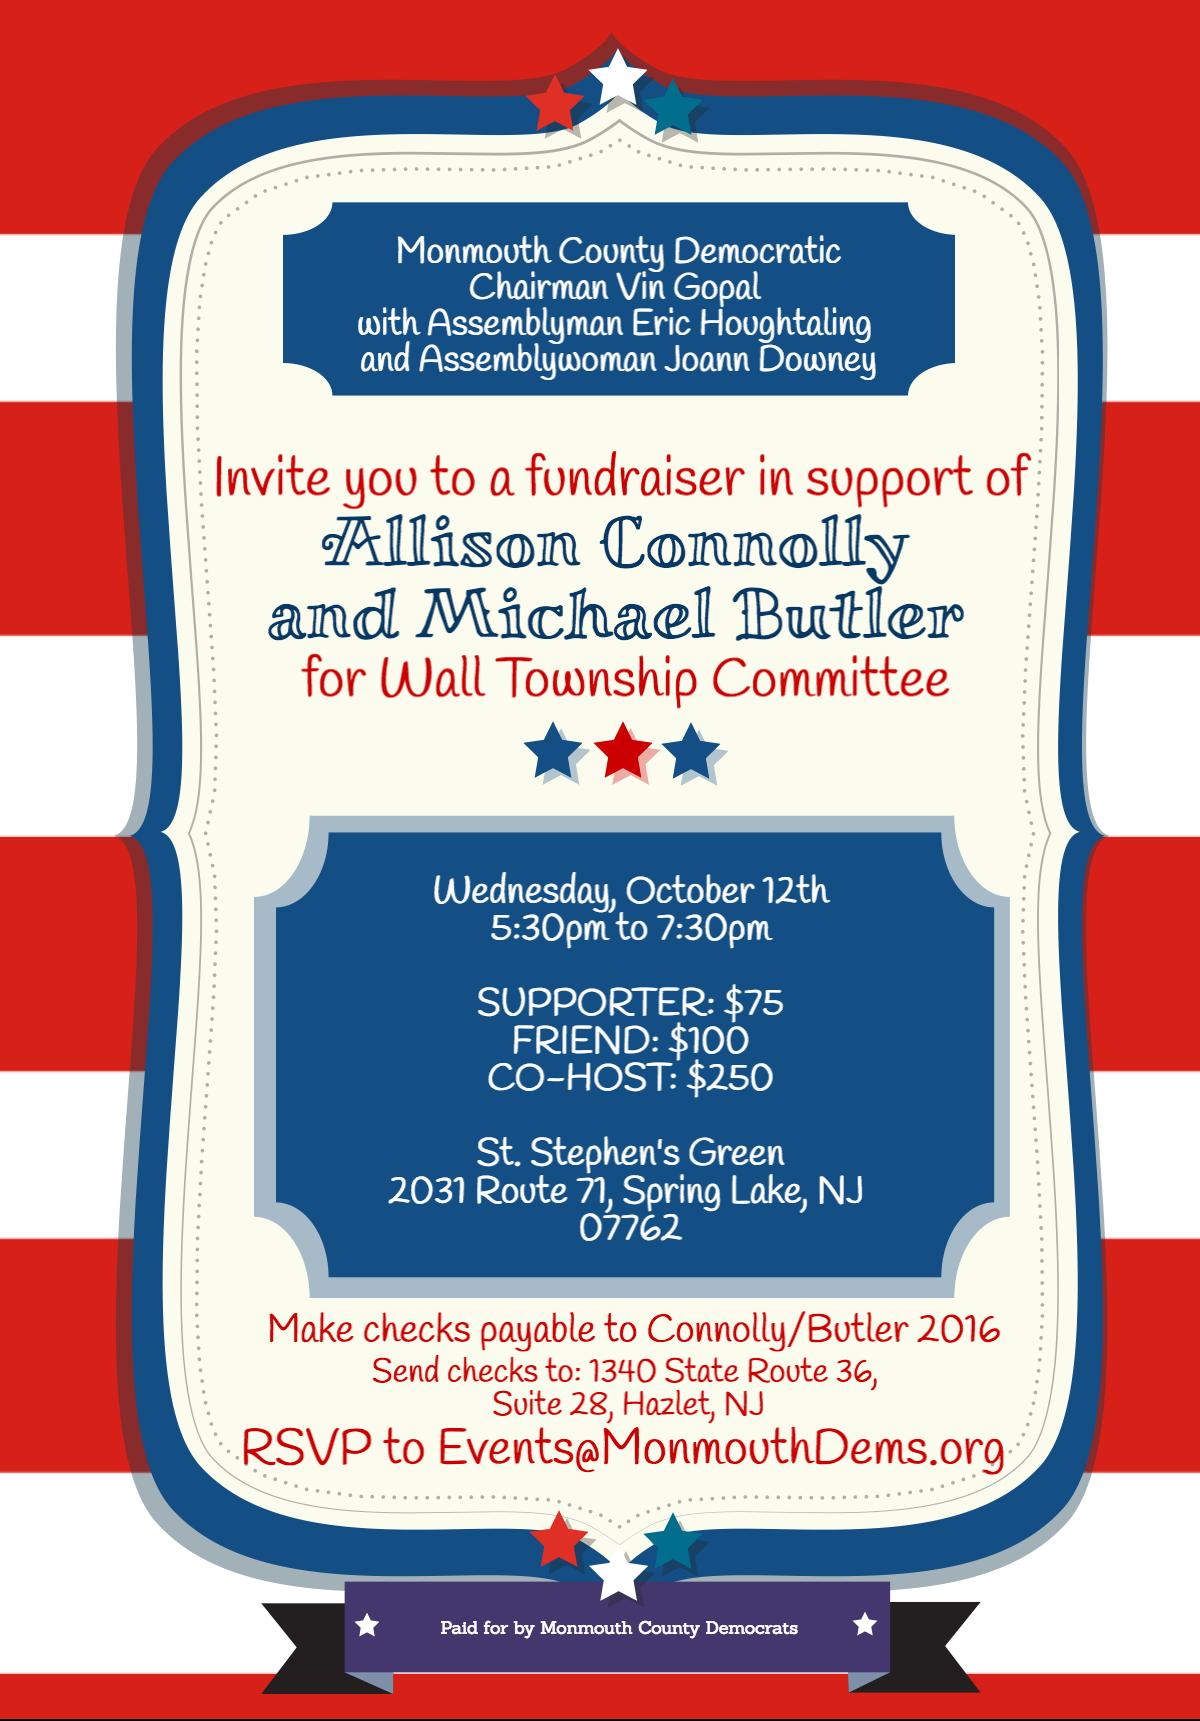 wall-fundraiser_16327383_531bf5eb4f7fd4f240d46a085897e4ff9d4e700d.png